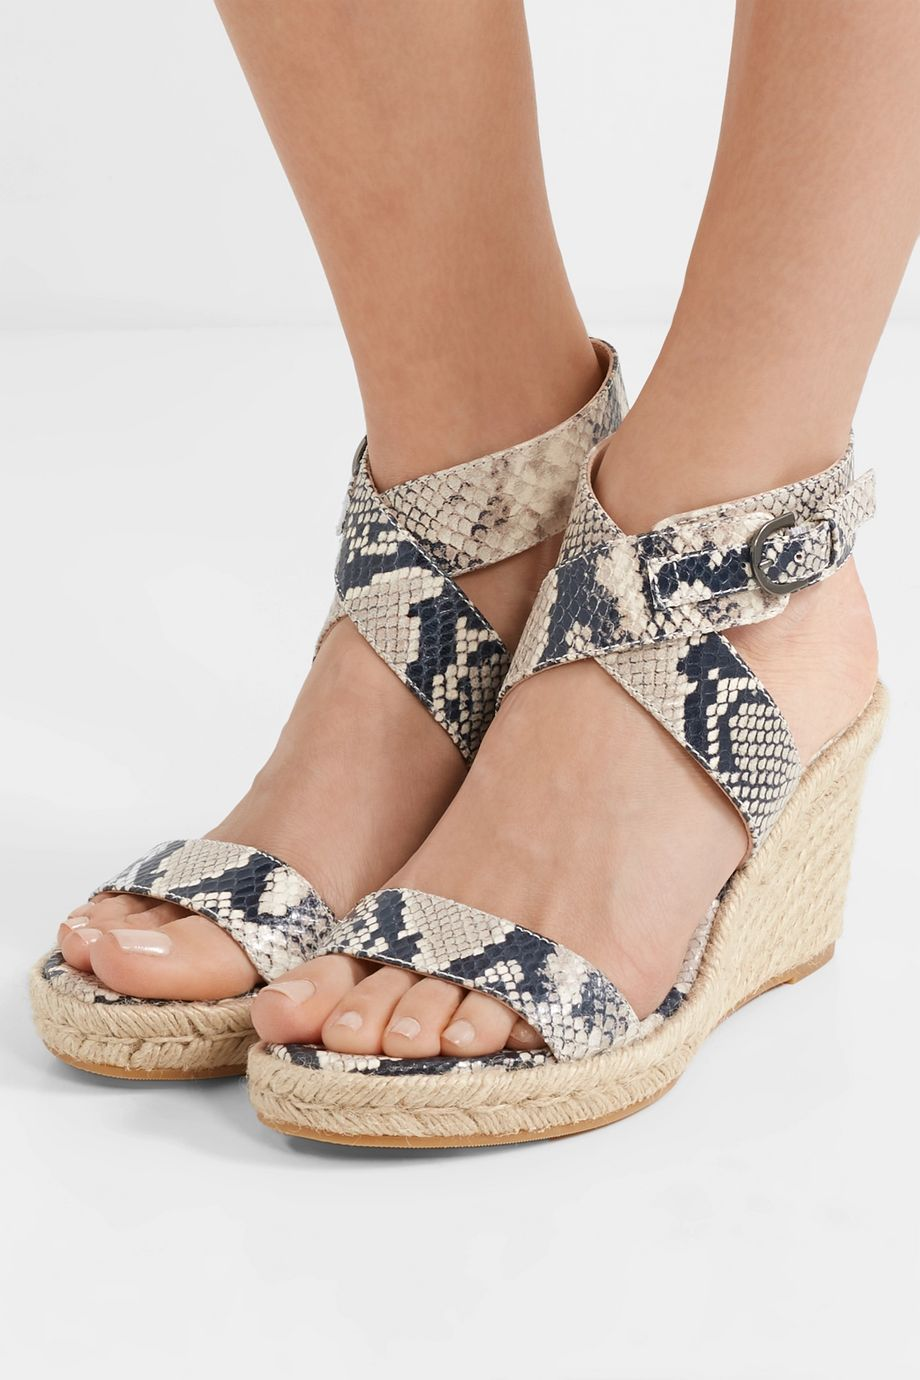 Stuart Weitzman Lexia snake-effect leather espadrille wedge sandals